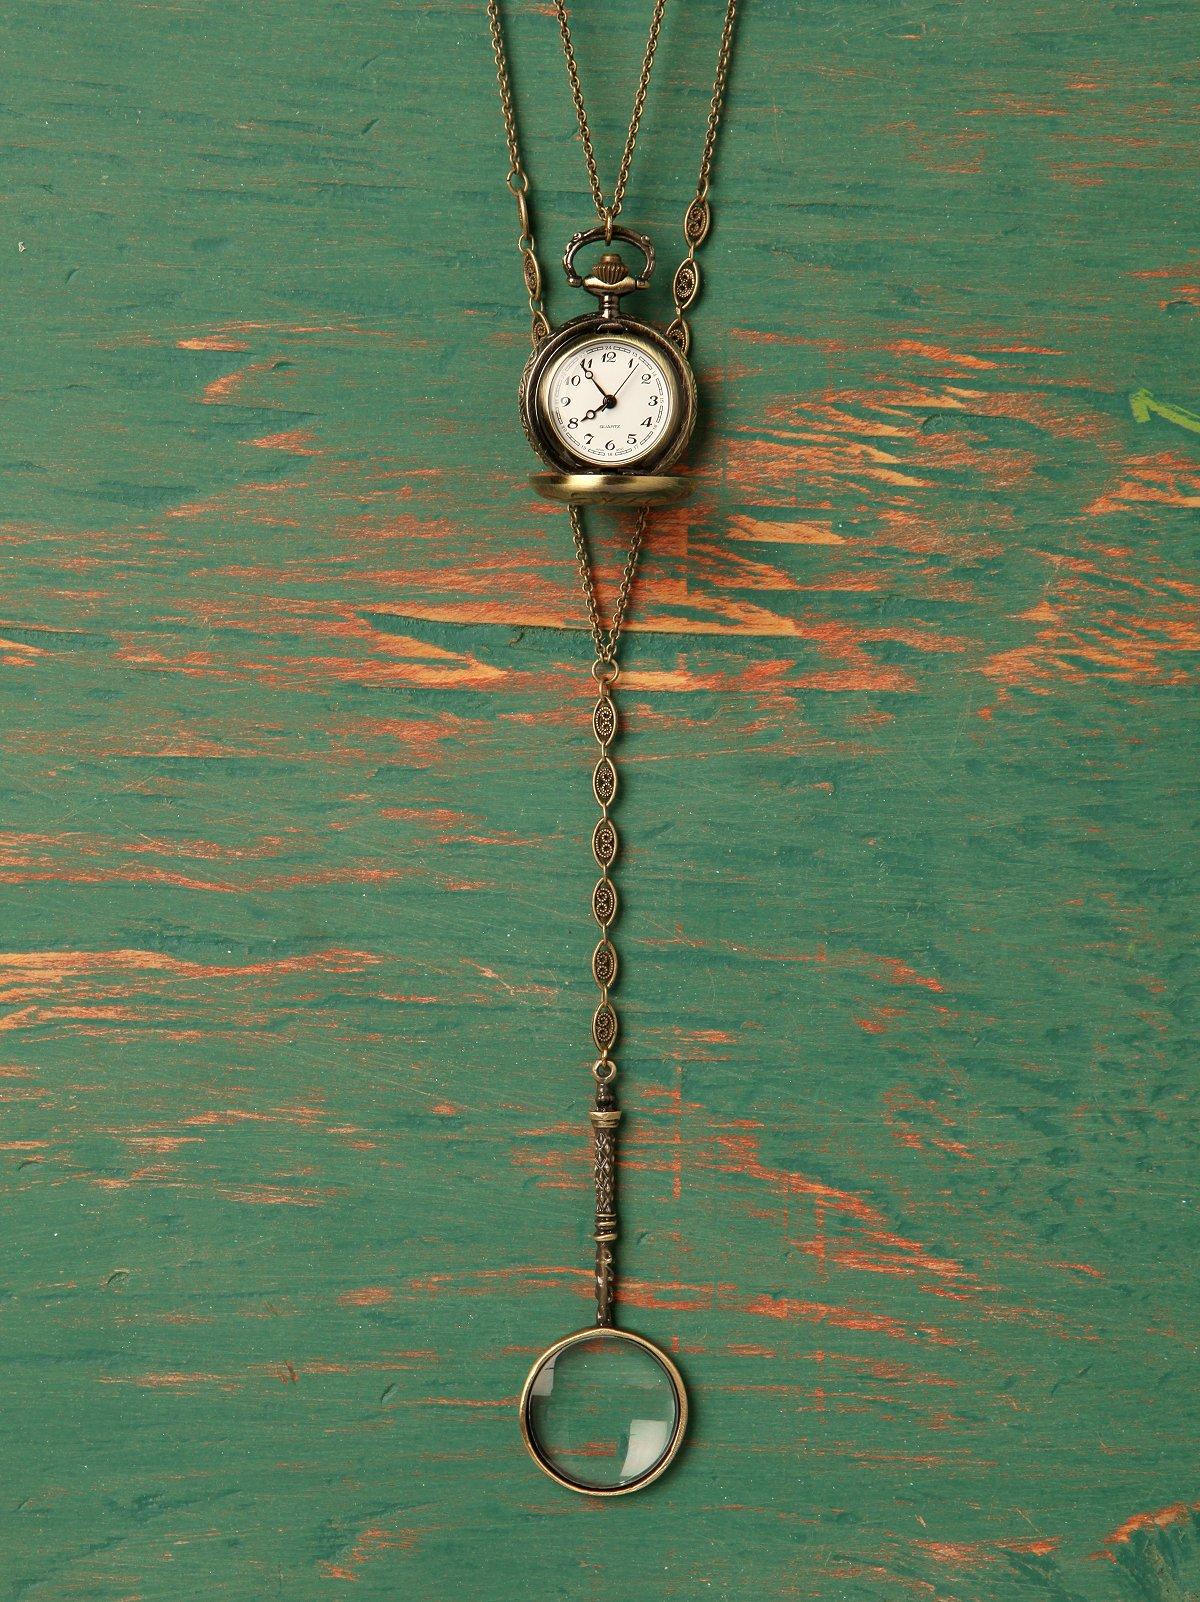 Magnify Locketcharm Necklace